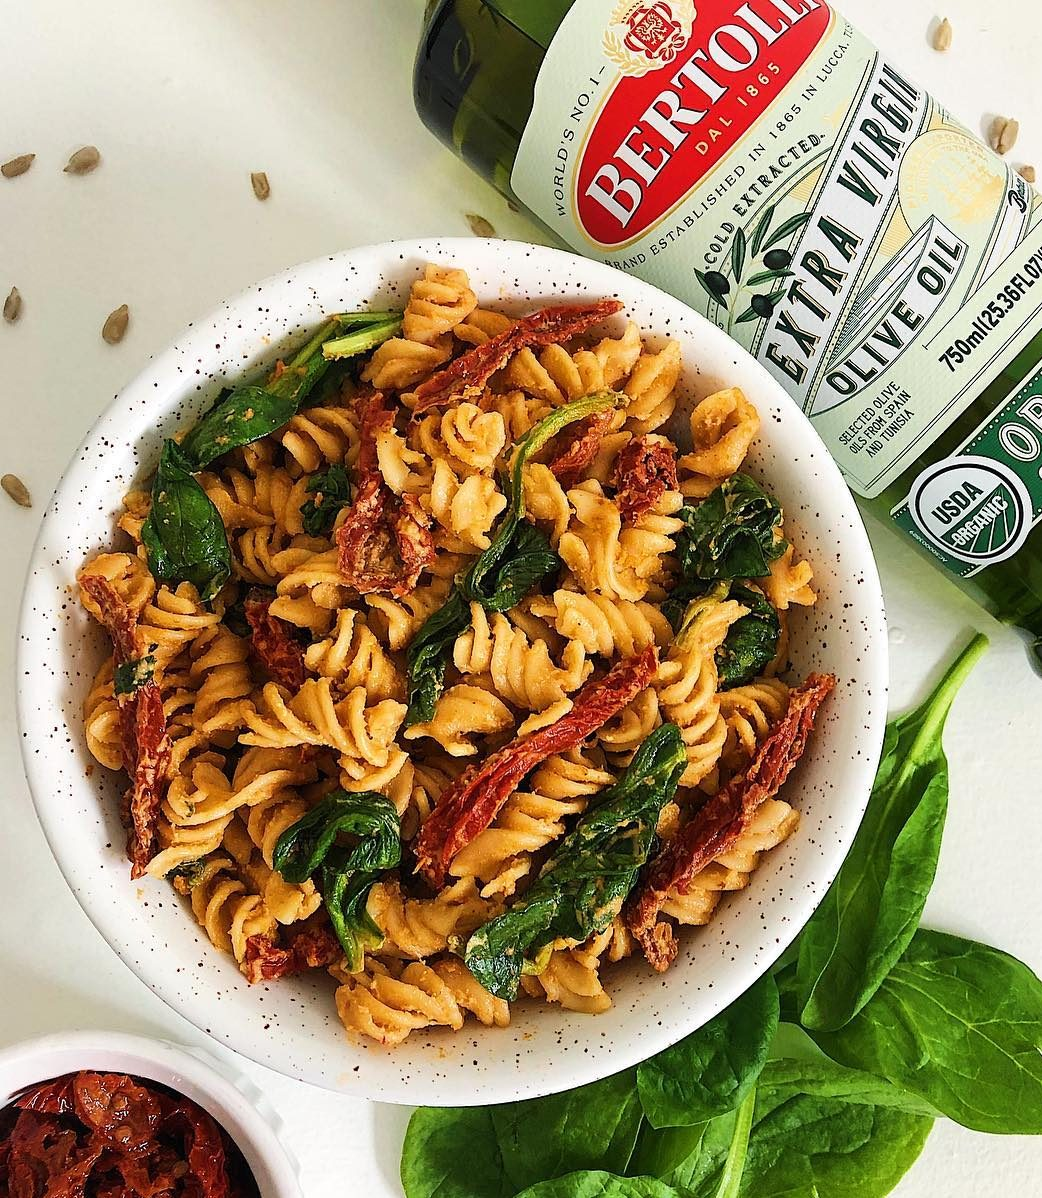 Sundried Tomato Pasta with Bertolli Olive Oil